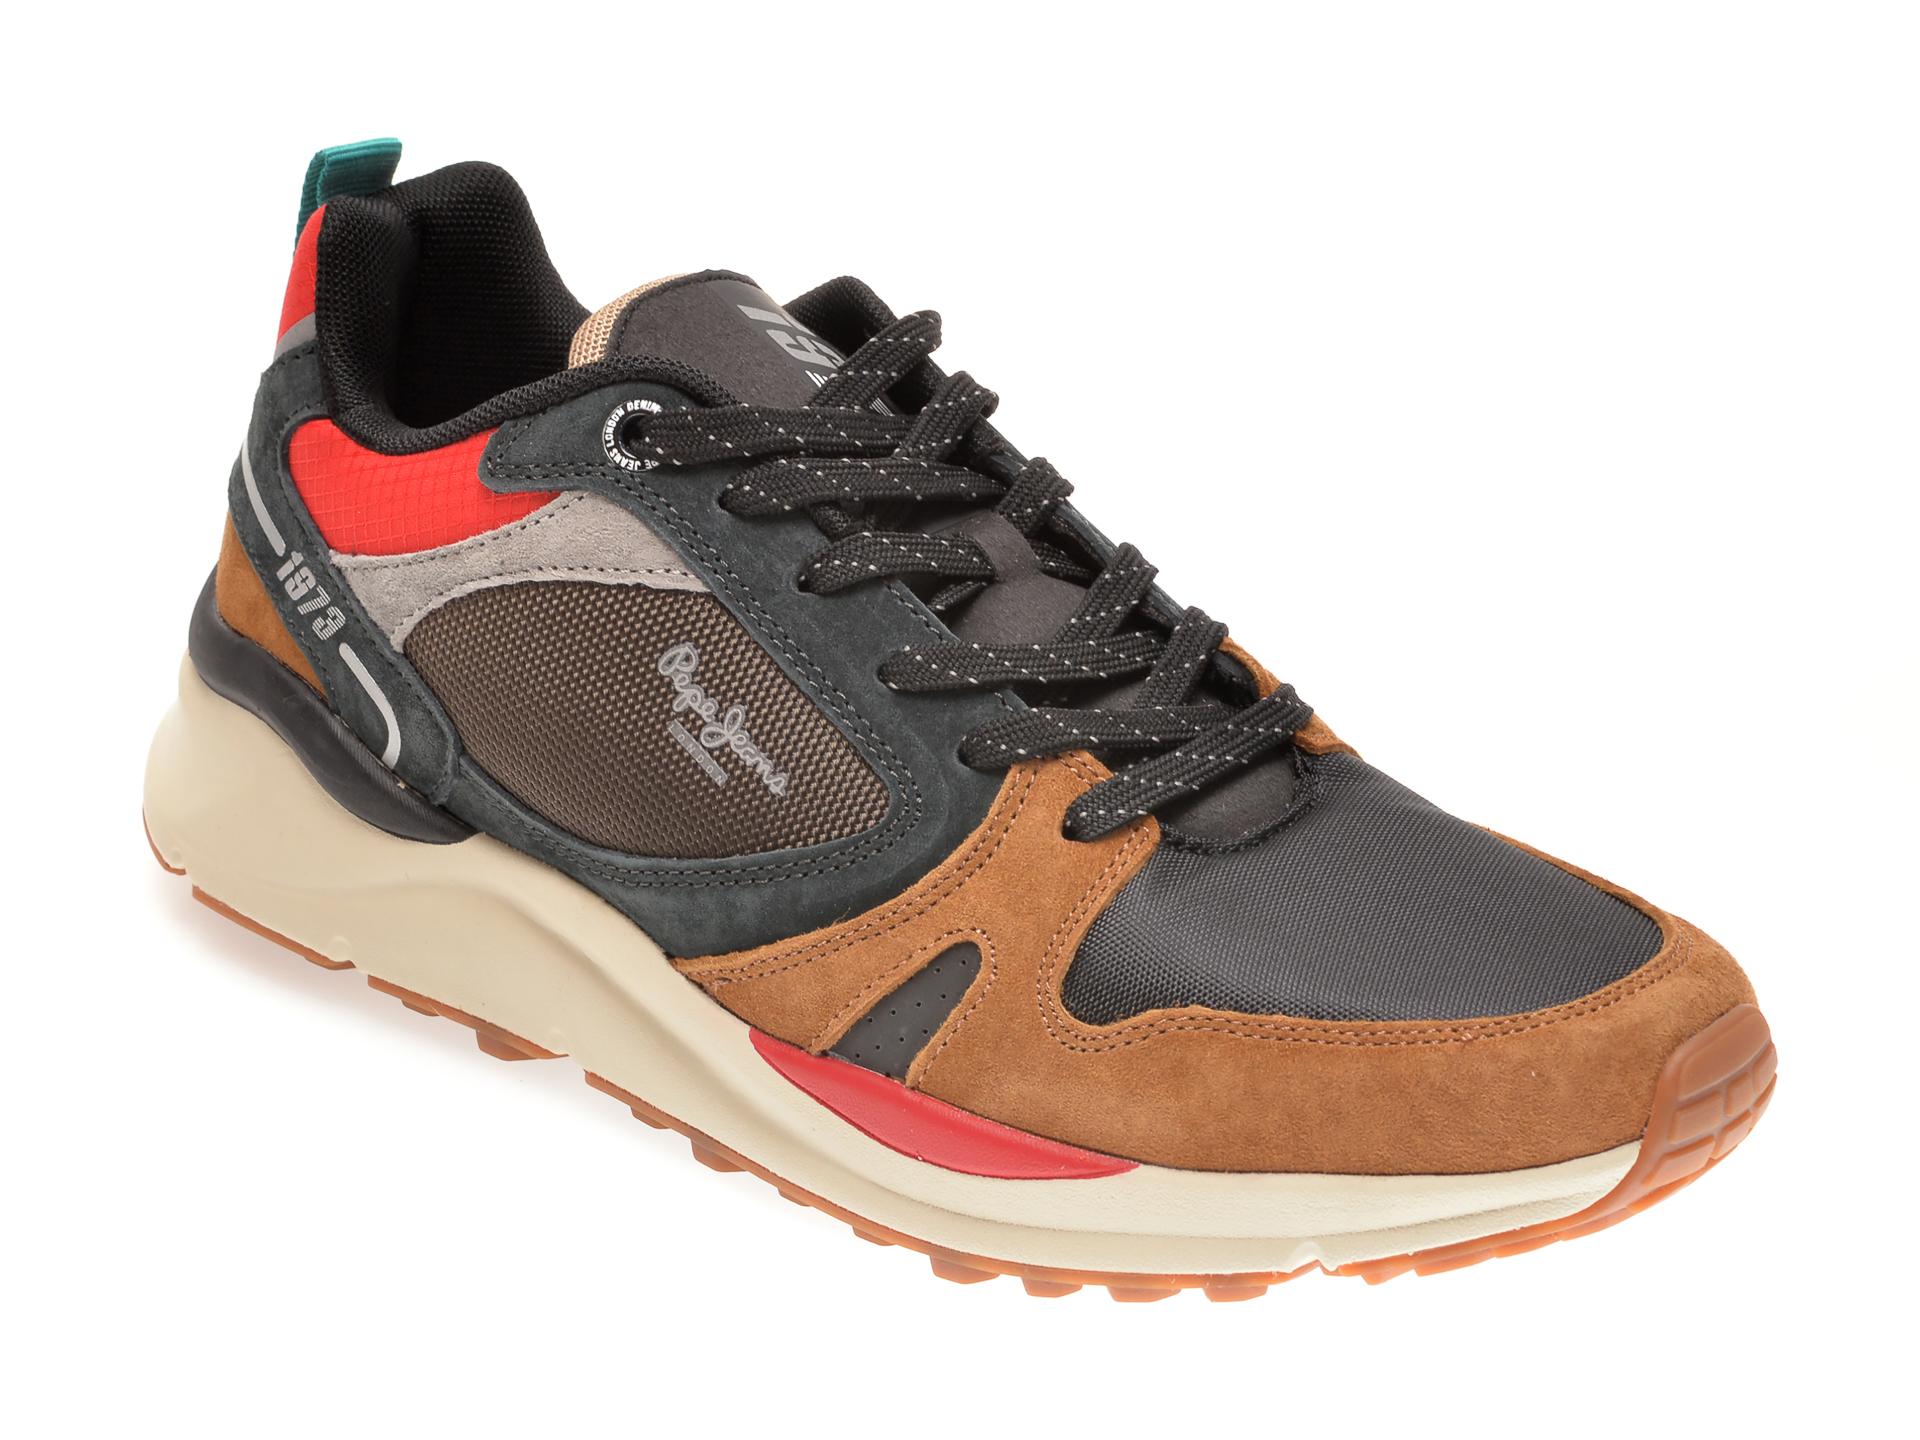 Pantofi sport PEPE JEANS maro, MS30678, din material textil si piele intoarsa New